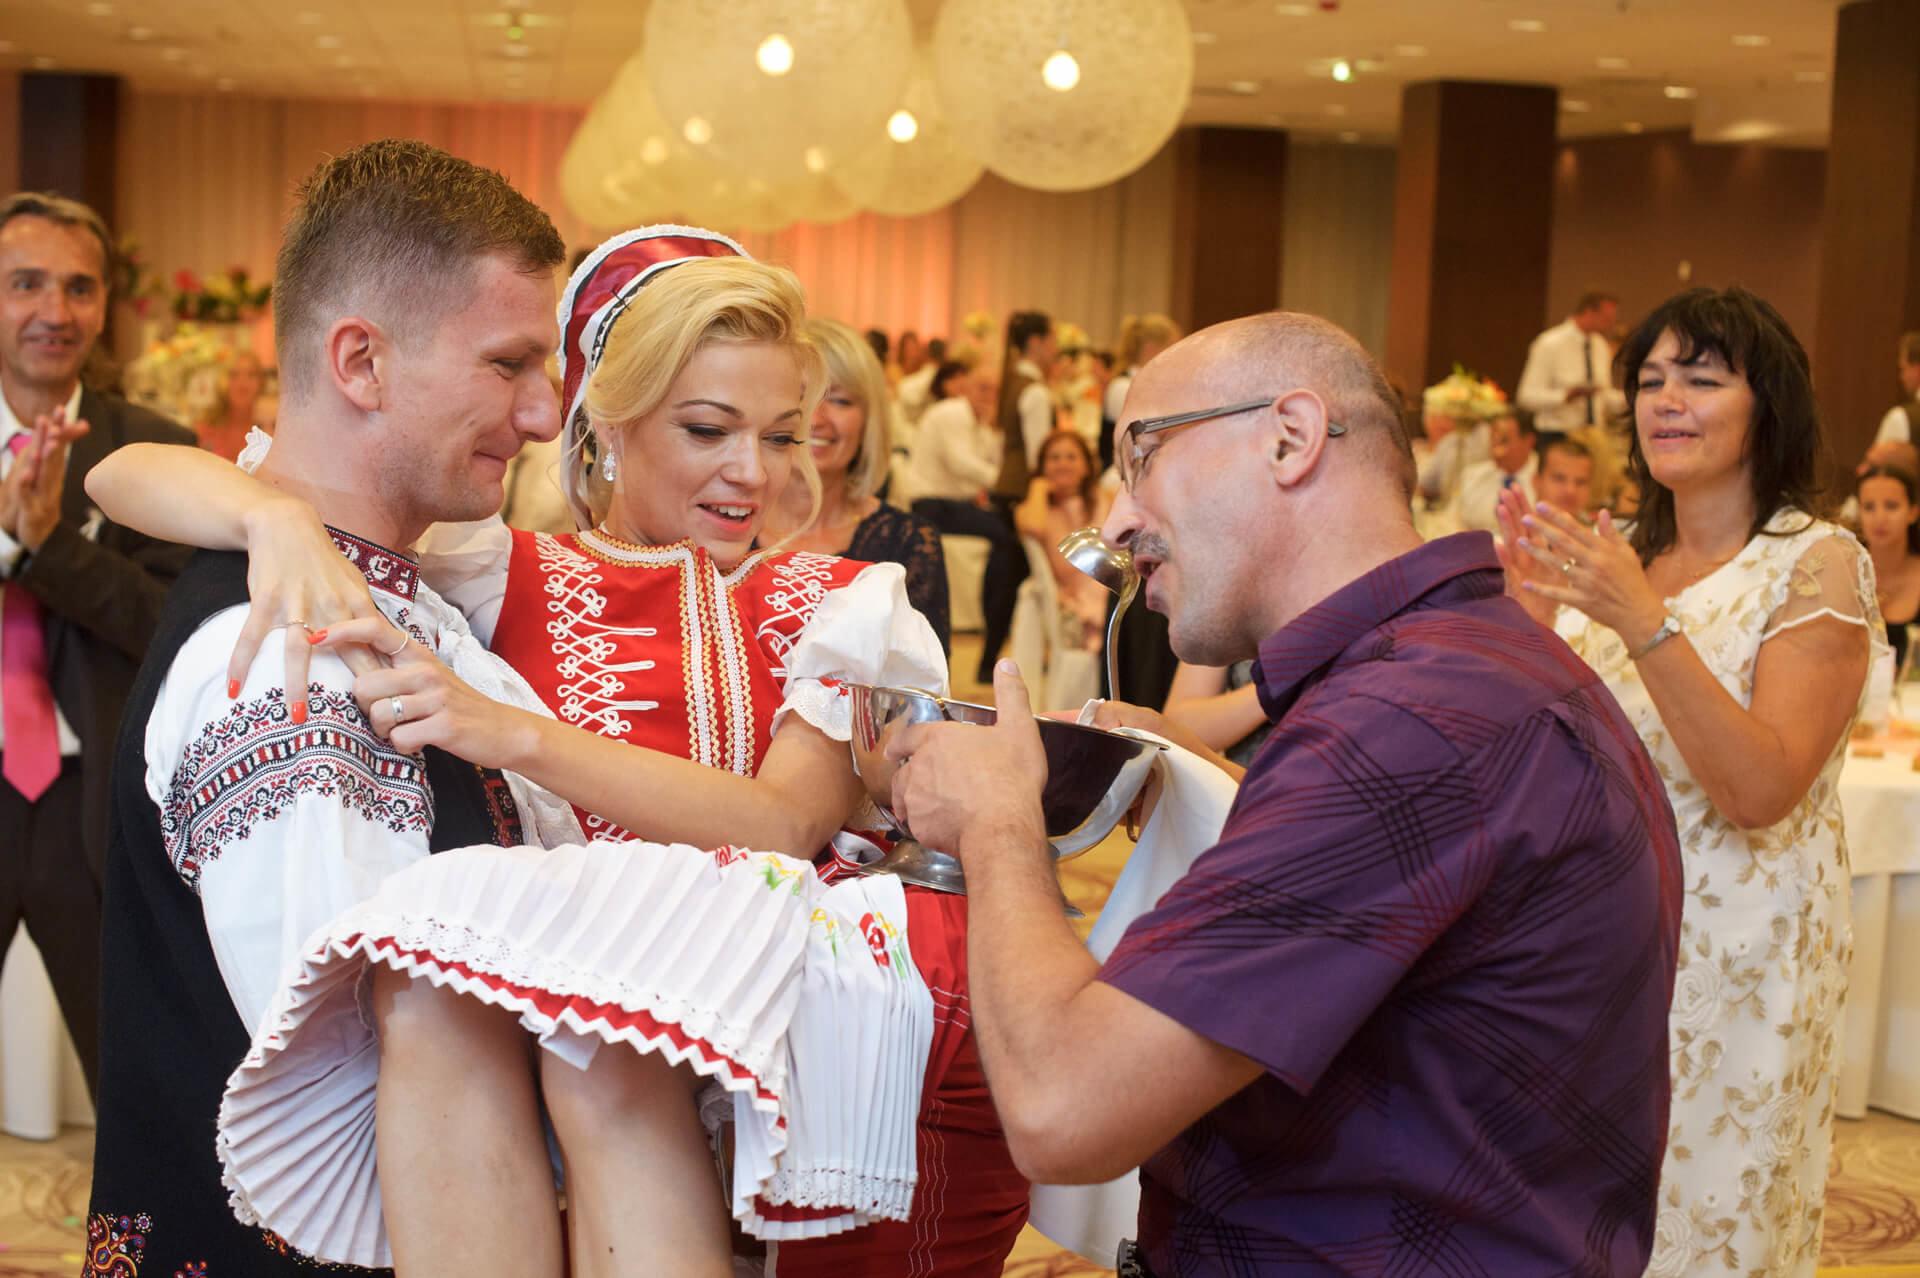 svadba svadobny čepčenie profesionalne fotenie fotograf Peter Norulak Kosice__11